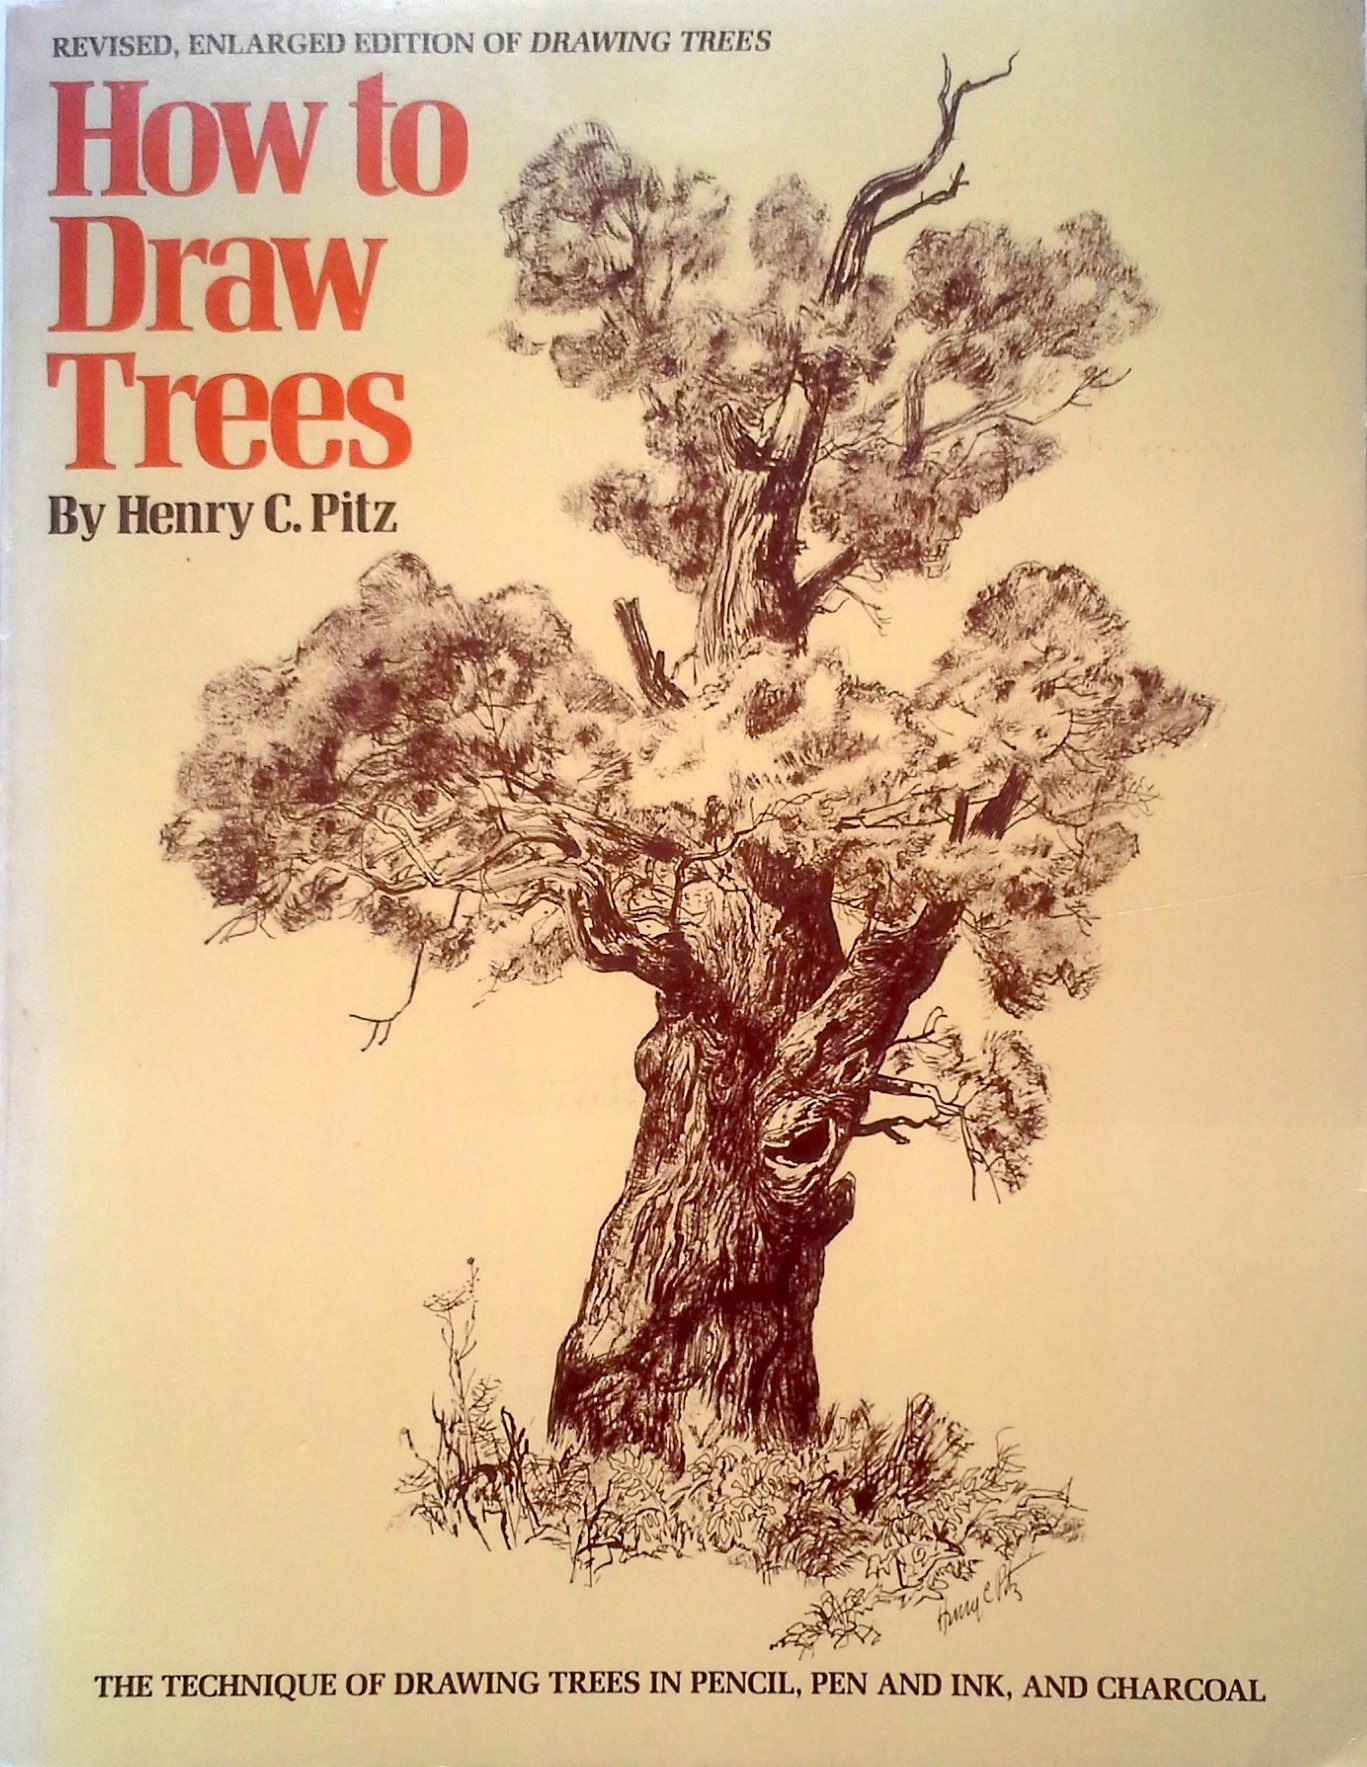 how to draw trees henry c pitz 9780823014422 amazon com books